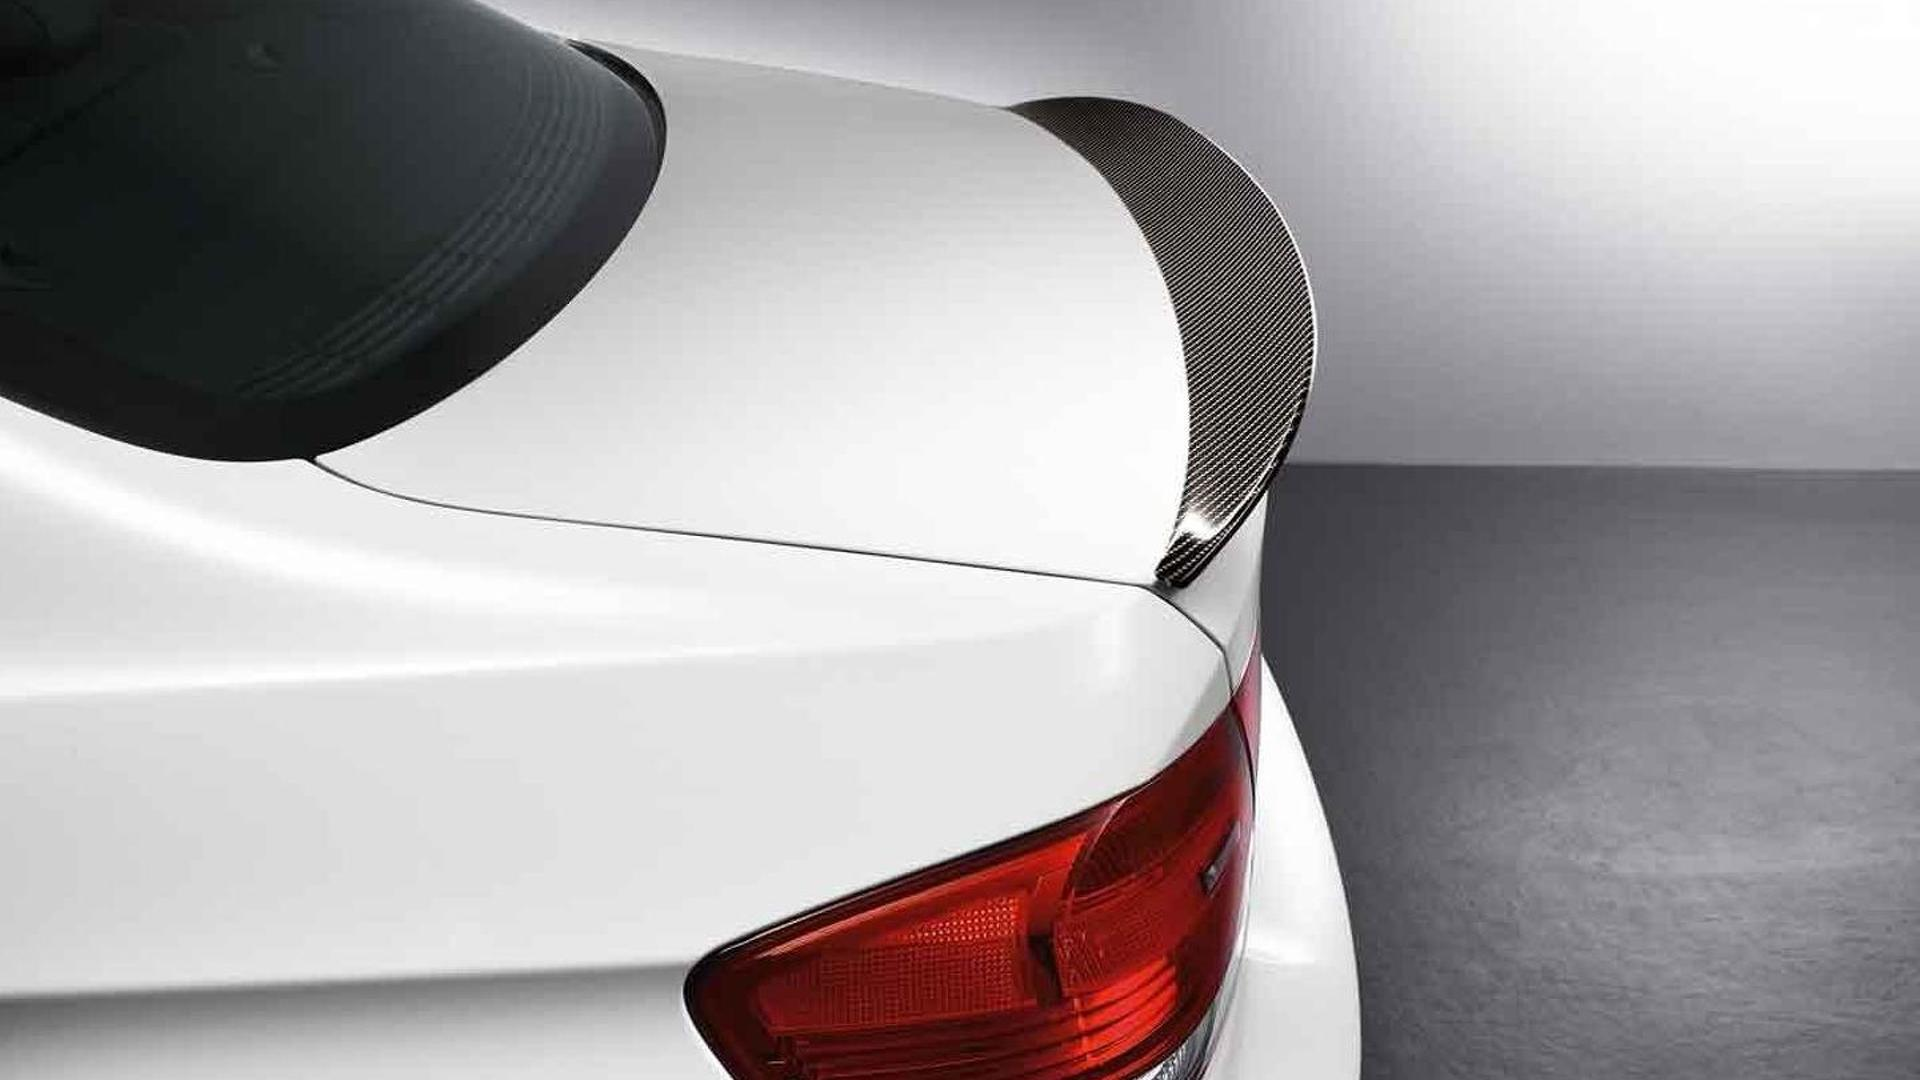 BMW Performance carbon fiber aerodynamic accessories for M3